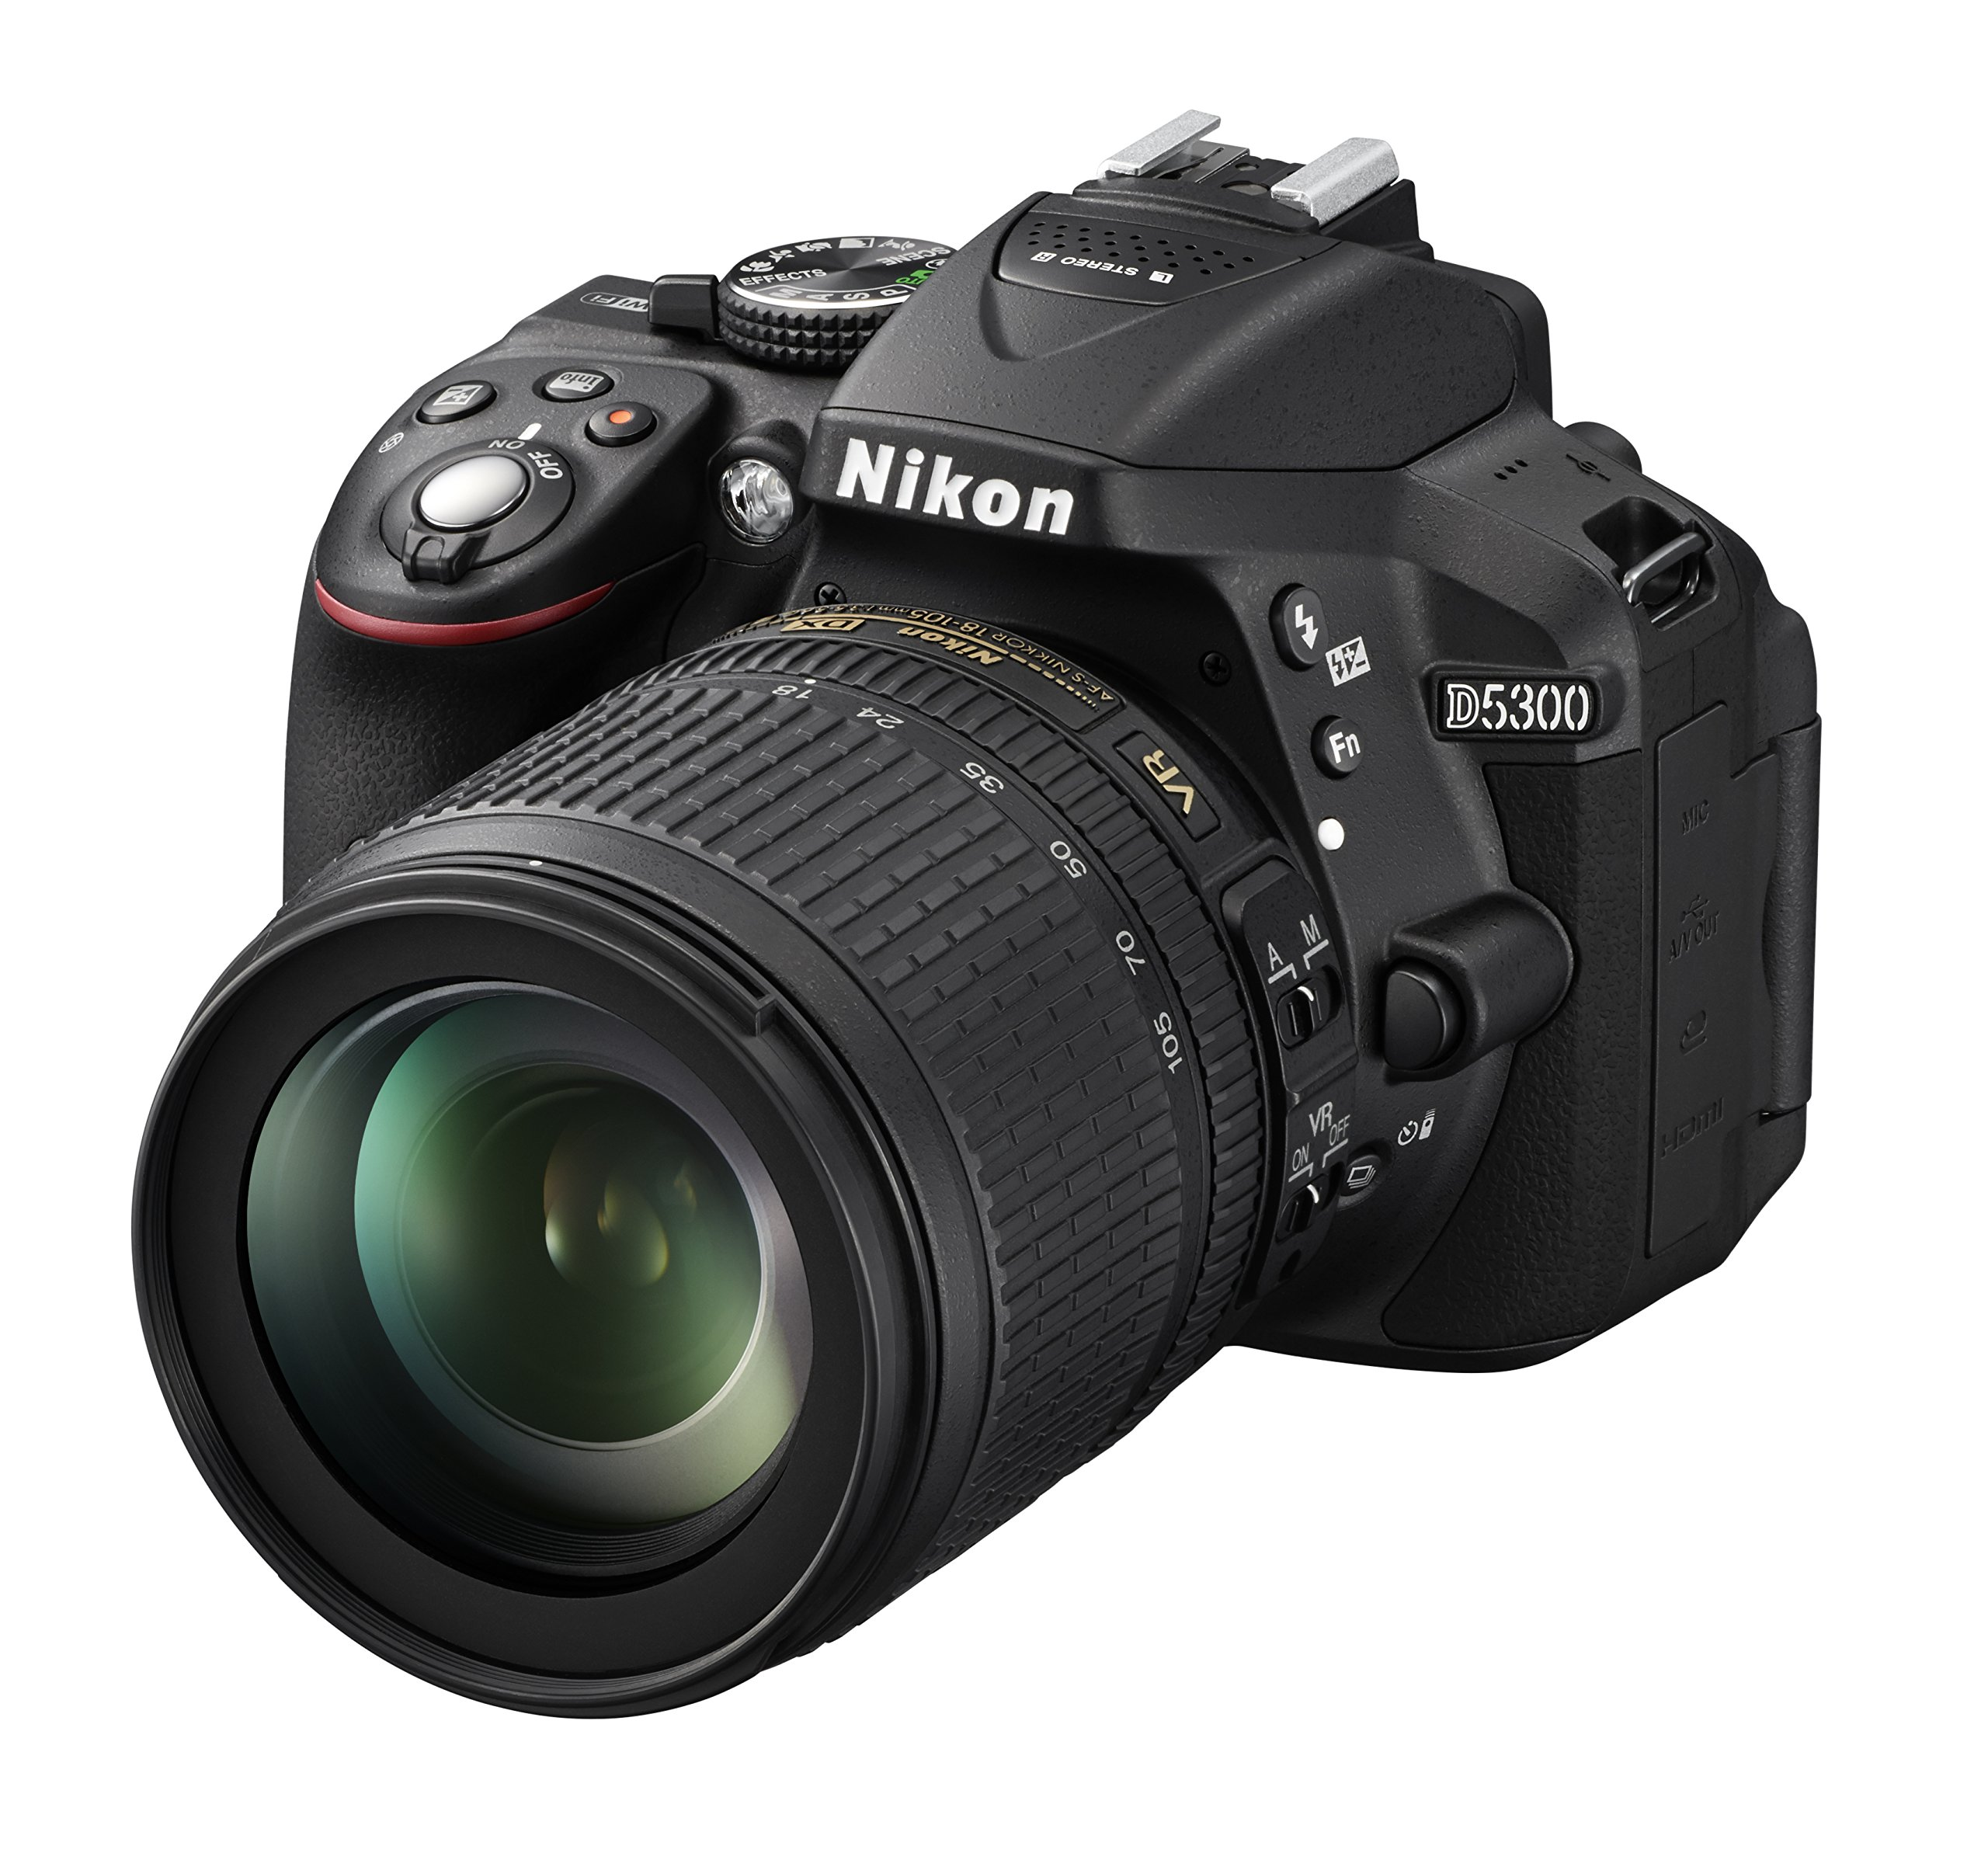 "Nikon D5300 Fotocamera Digitale Reflex + Nikkor 18/105VR, 24.1 Mbps, LCD HD da 3"" Regolabile, SD da 8GB, 200x Premium Lexar, Nero [Nital Card: 4 Anni di Garanzia] product image"